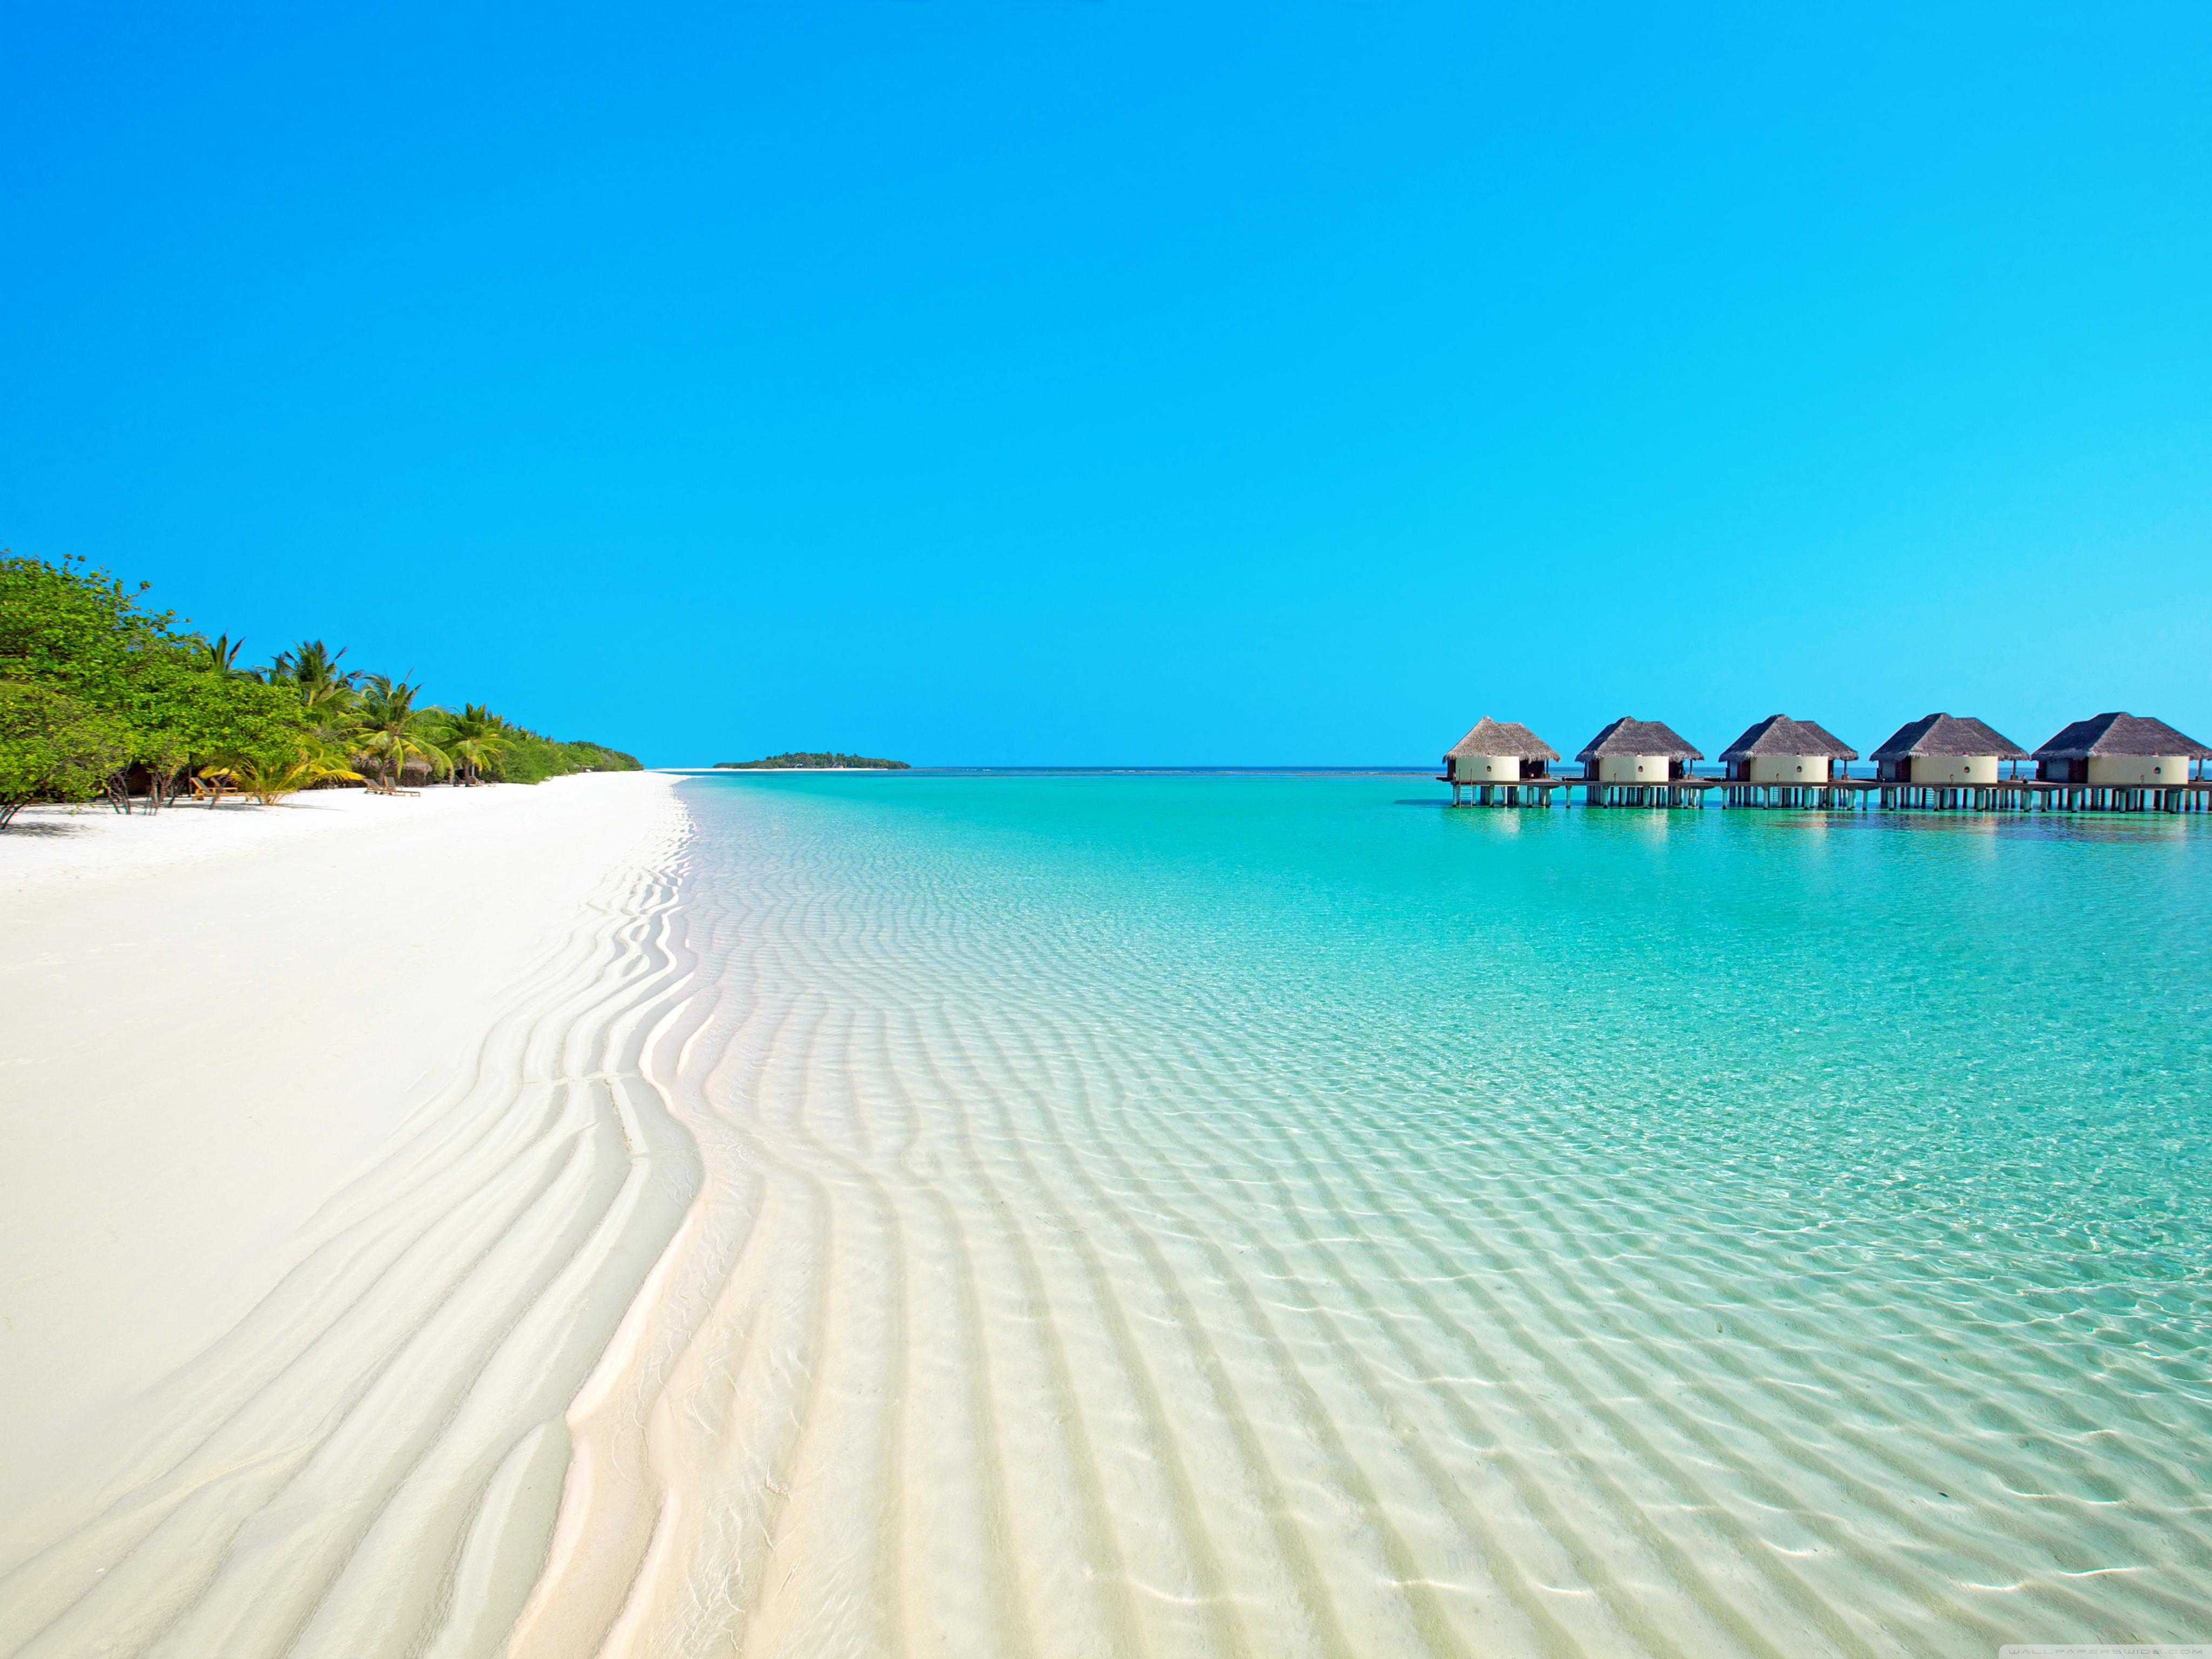 Island Beach 4K HD Desktop Wallpaper for Dual Monitor 4096x3072